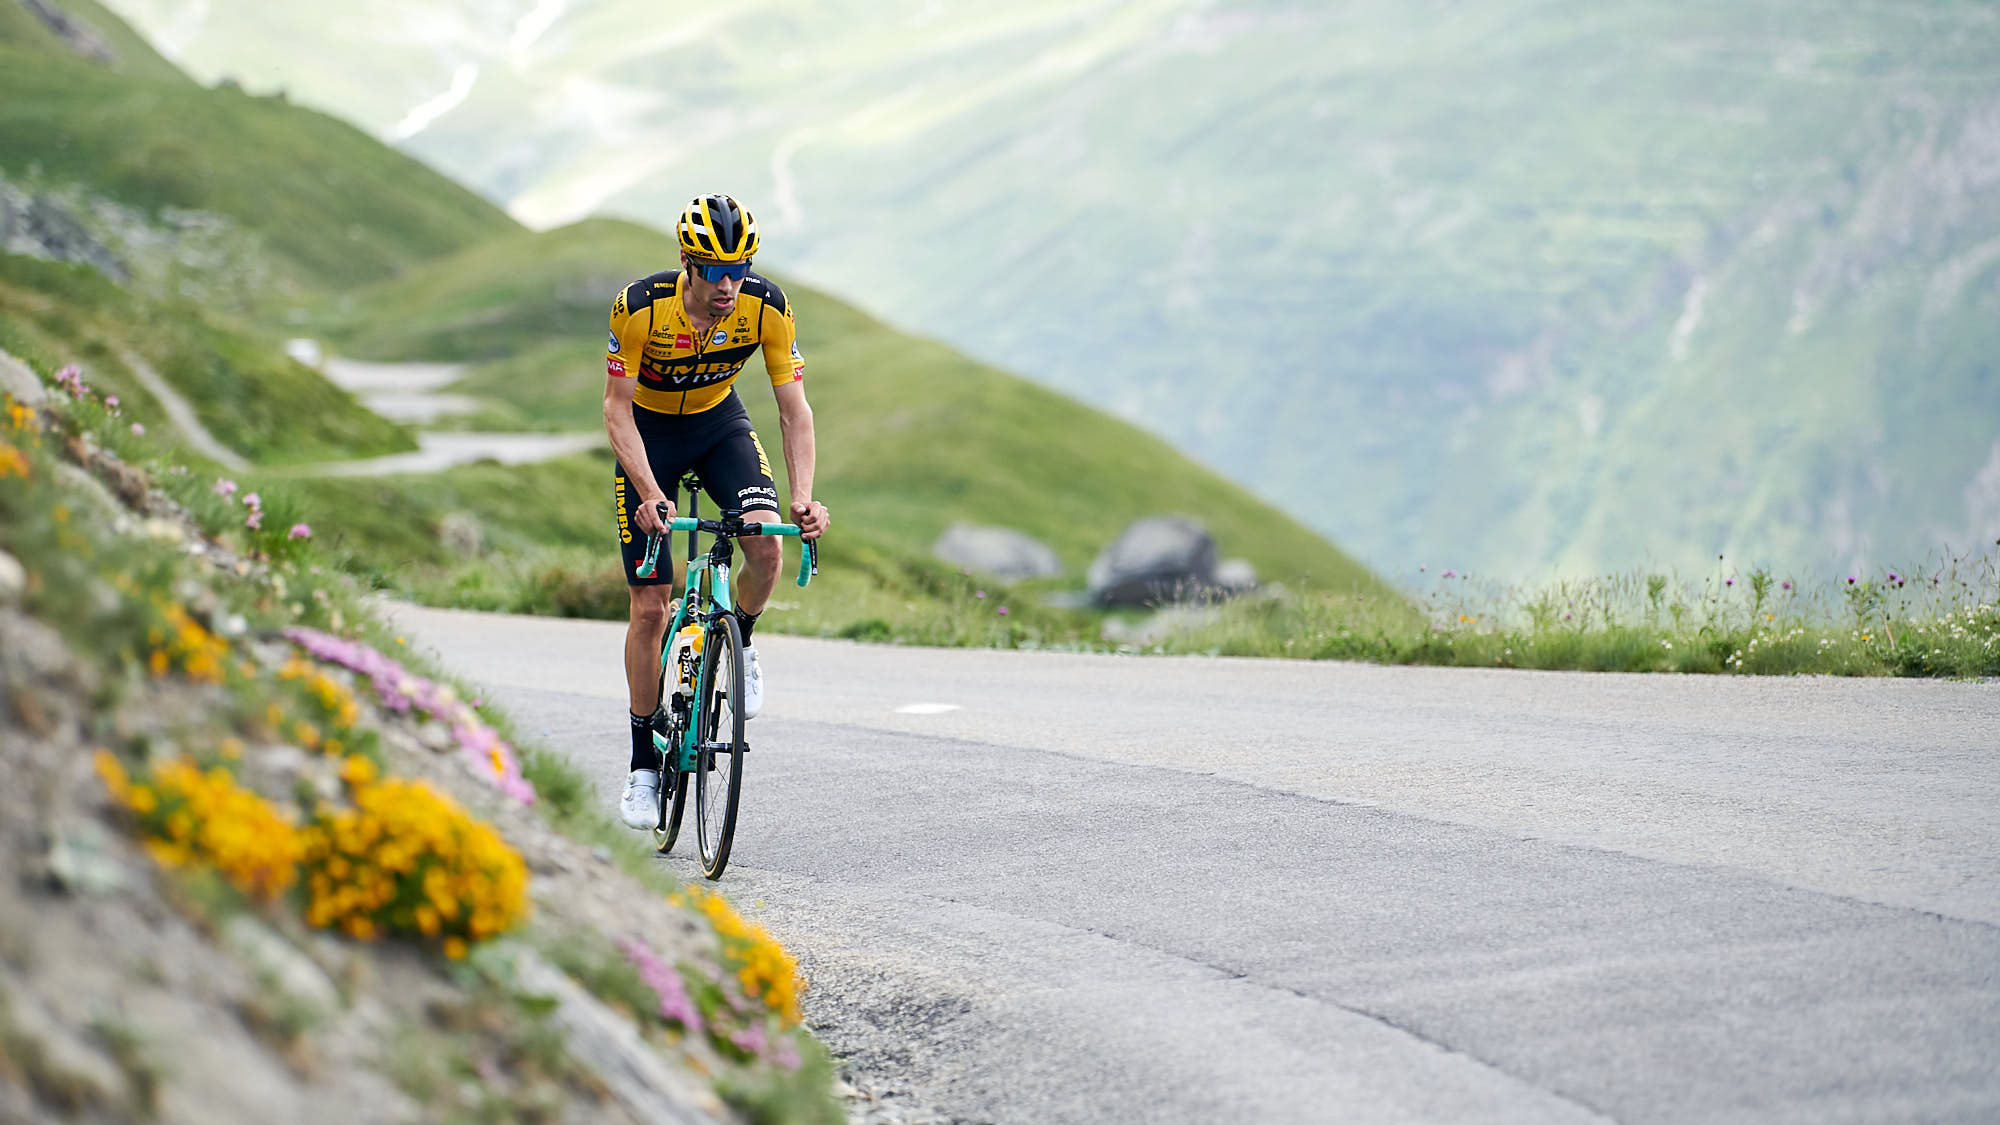 Tom Dumoulin on the Col de l'Iseran